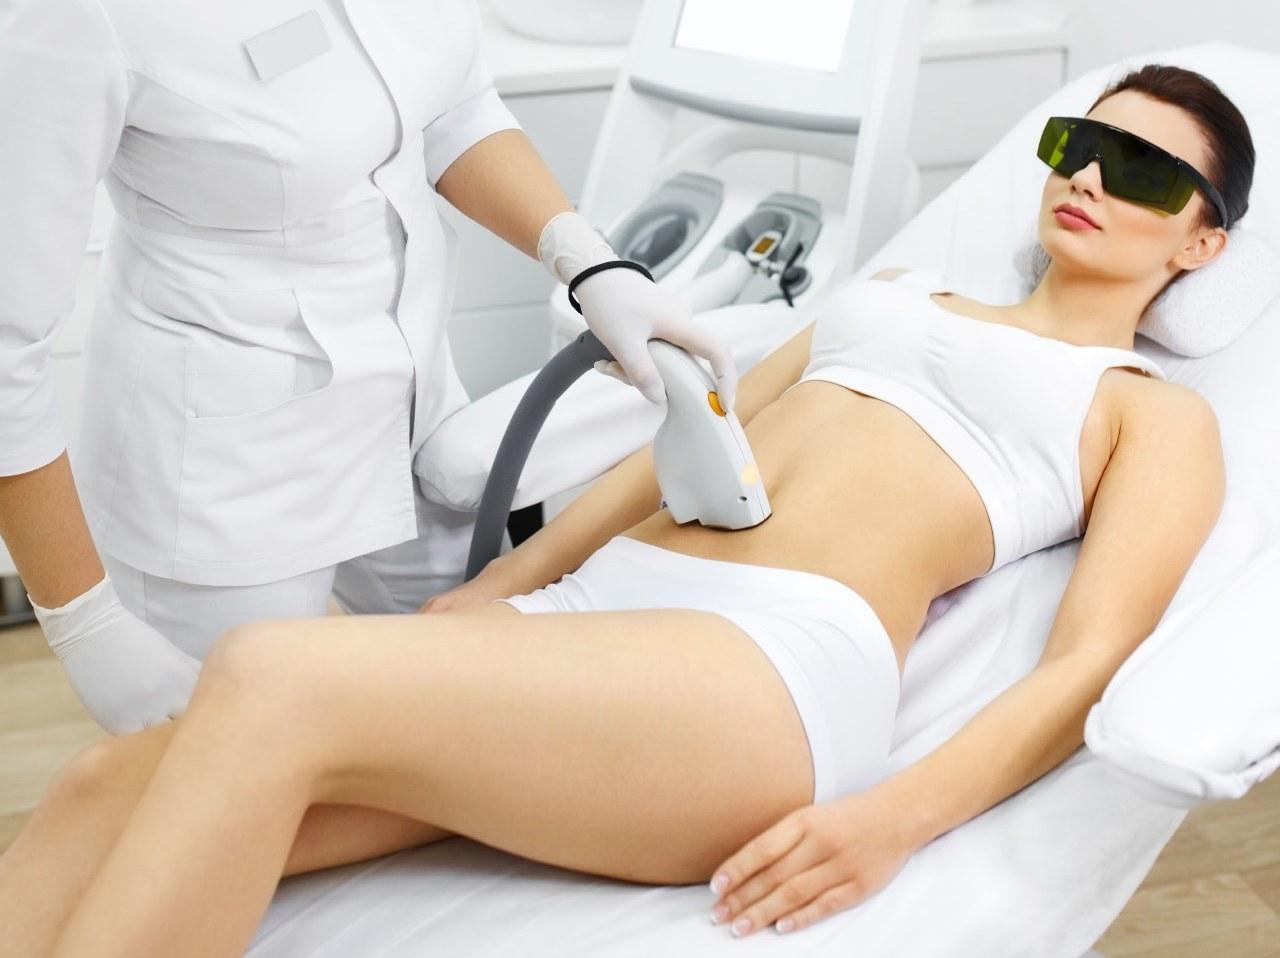 Is bikini laser hair removal harmful?